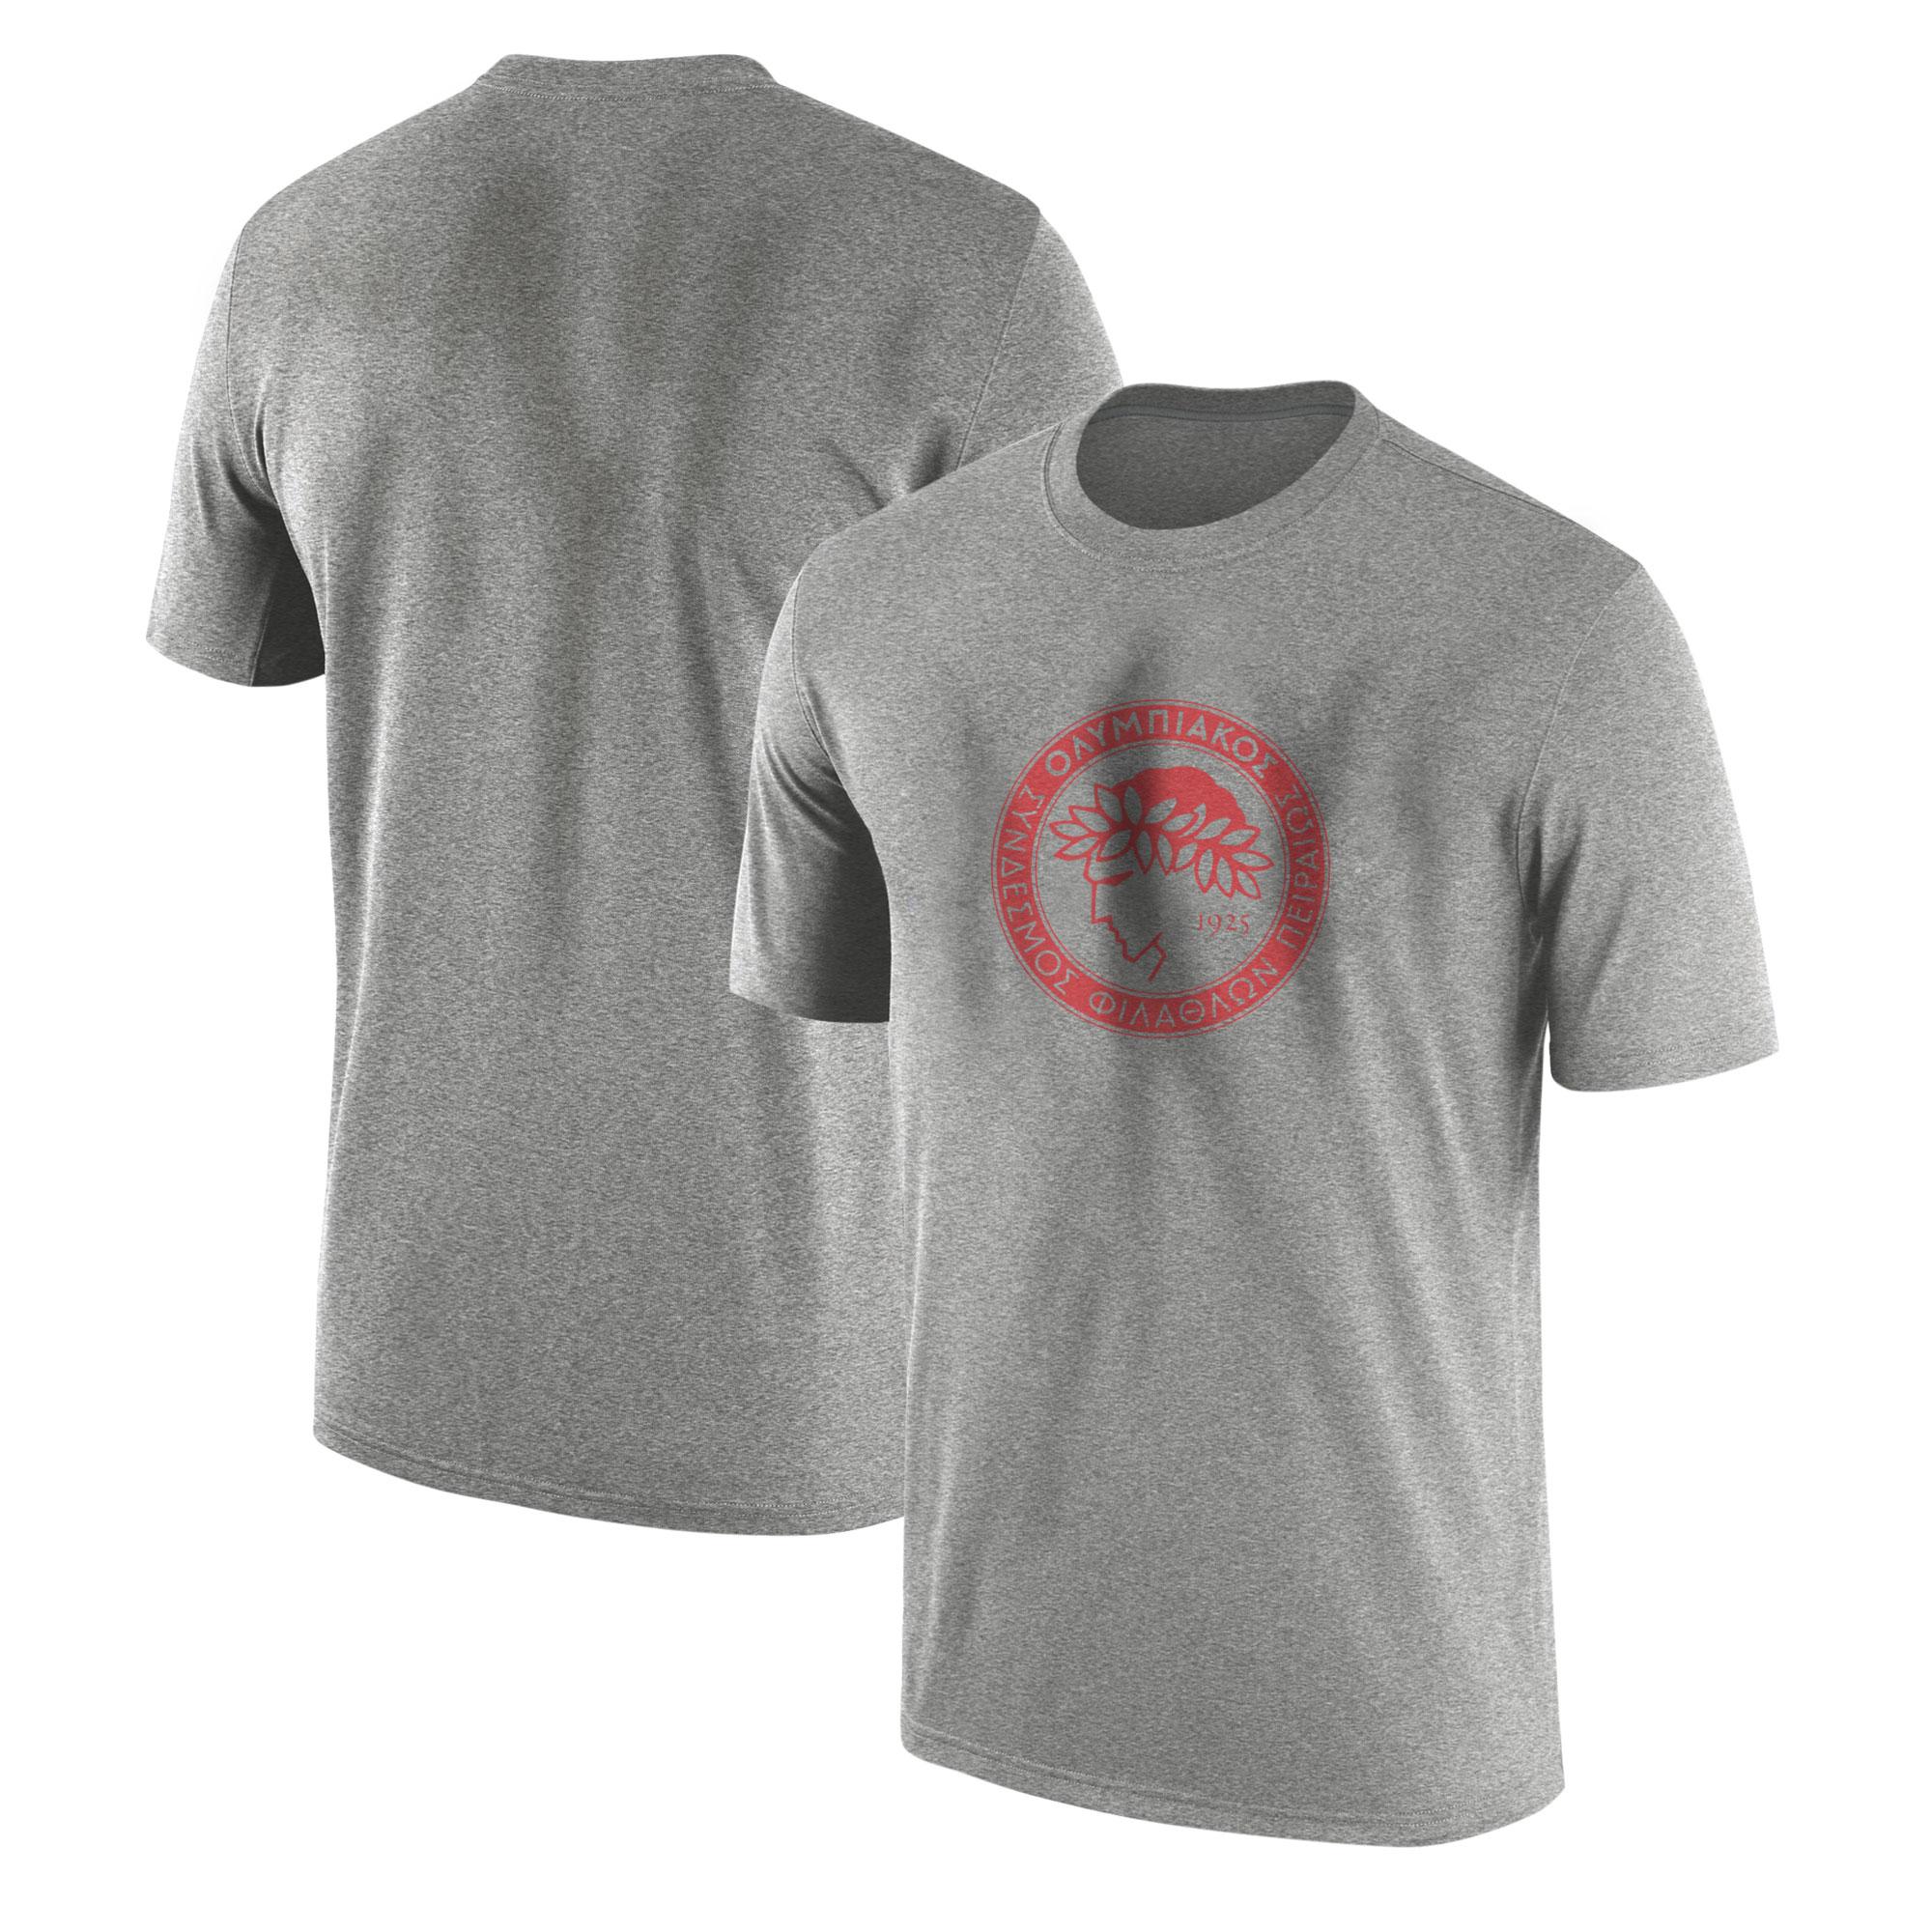 Euroleague Olympiakos Tshirt (TSH-GRY-NP-Euroleague-olympiakos01-514)